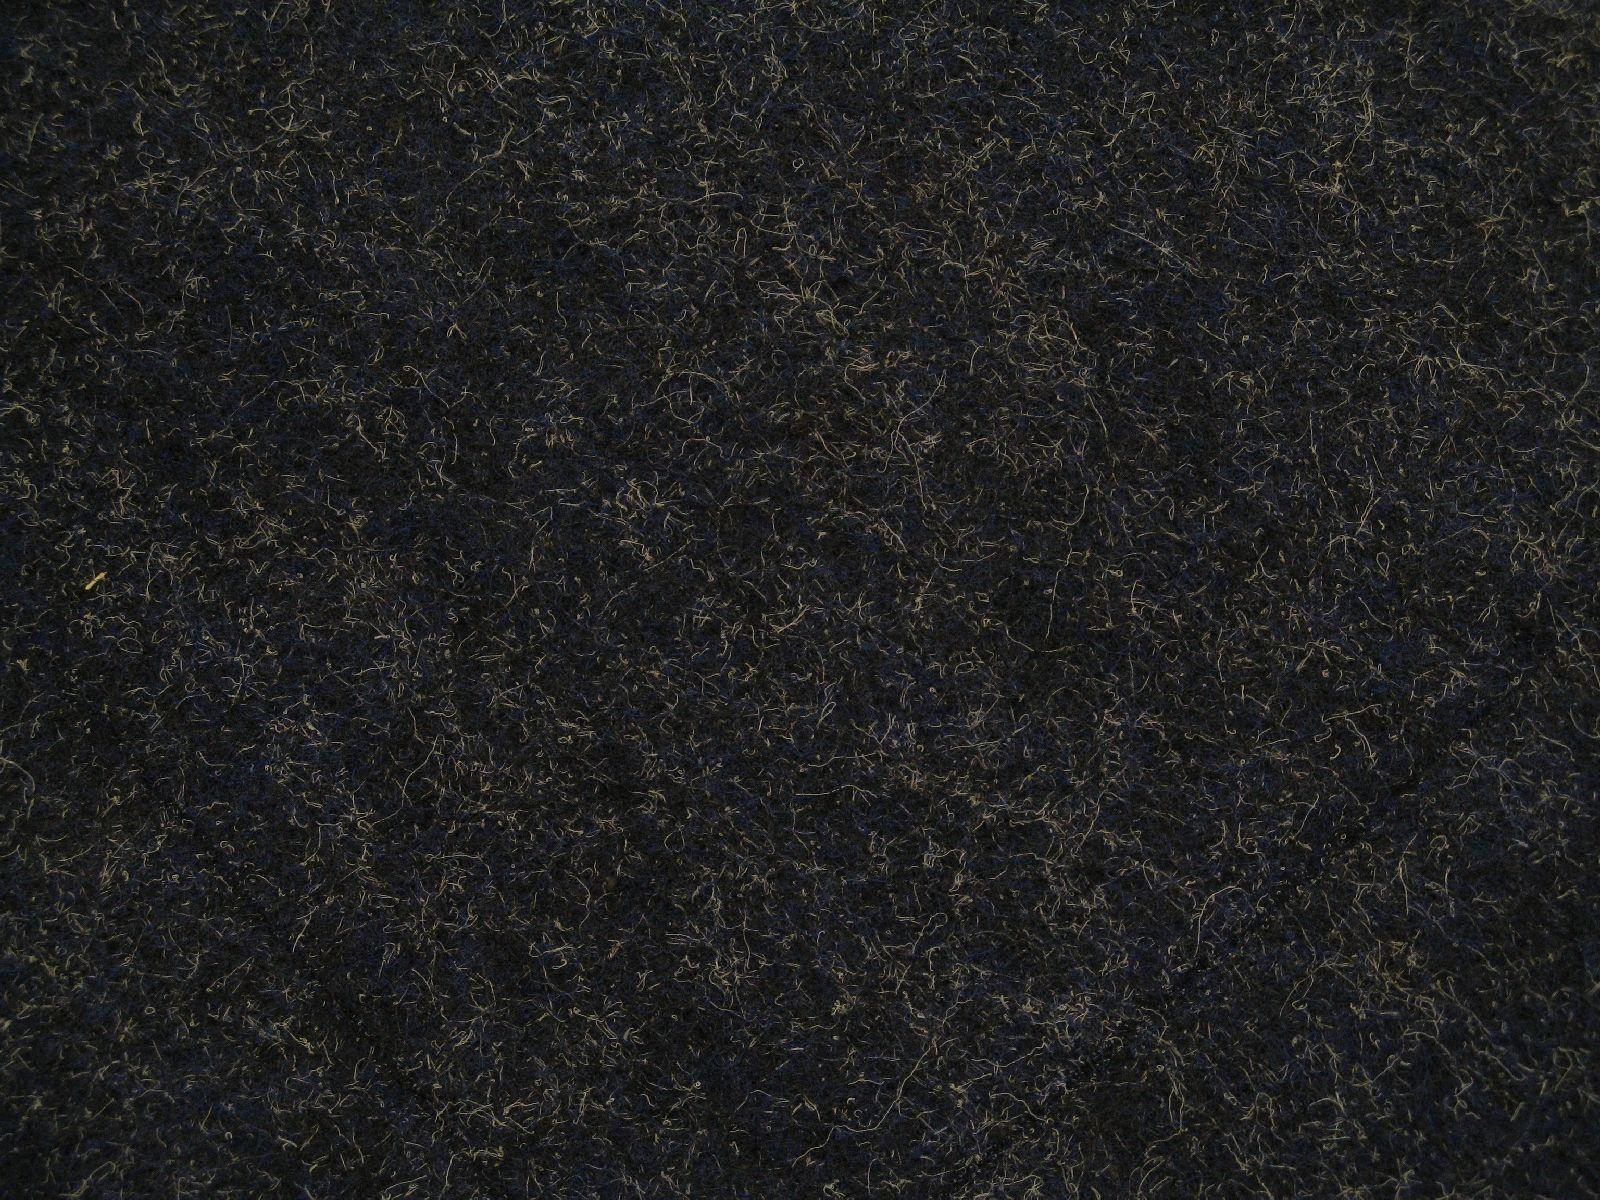 Innenraum-Material_Textur_B_01074